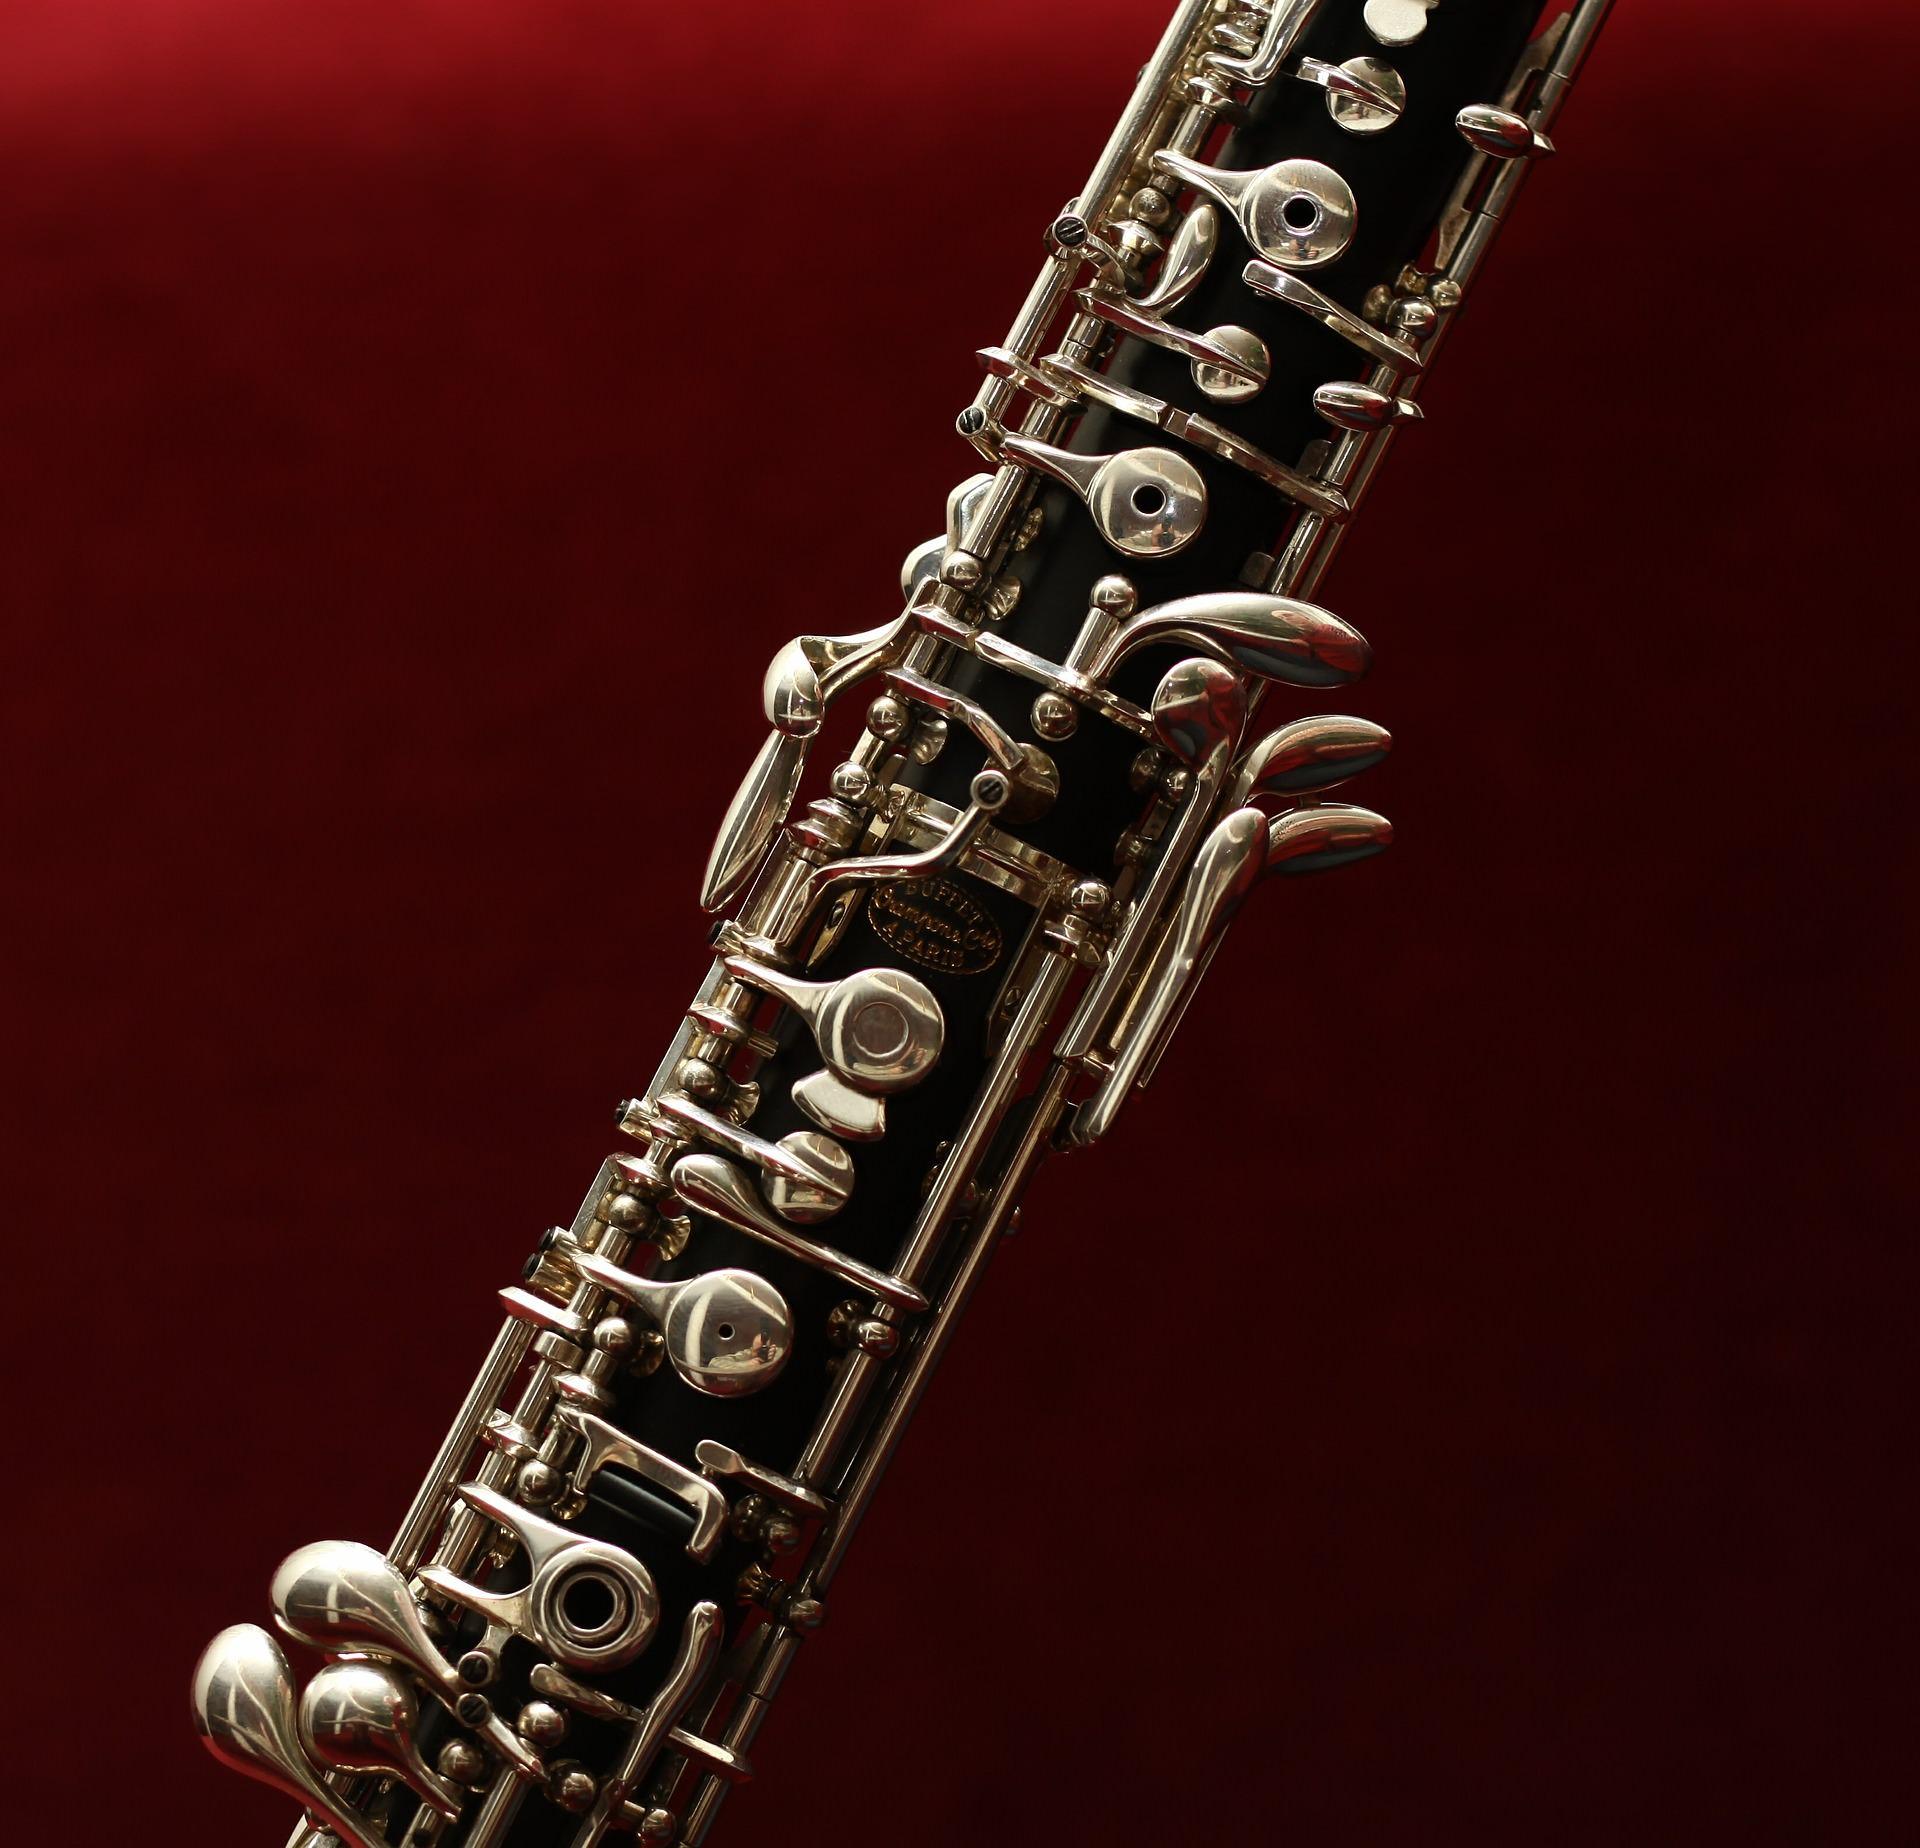 Oboe lernen: Oboe-Unterricht an der JMS